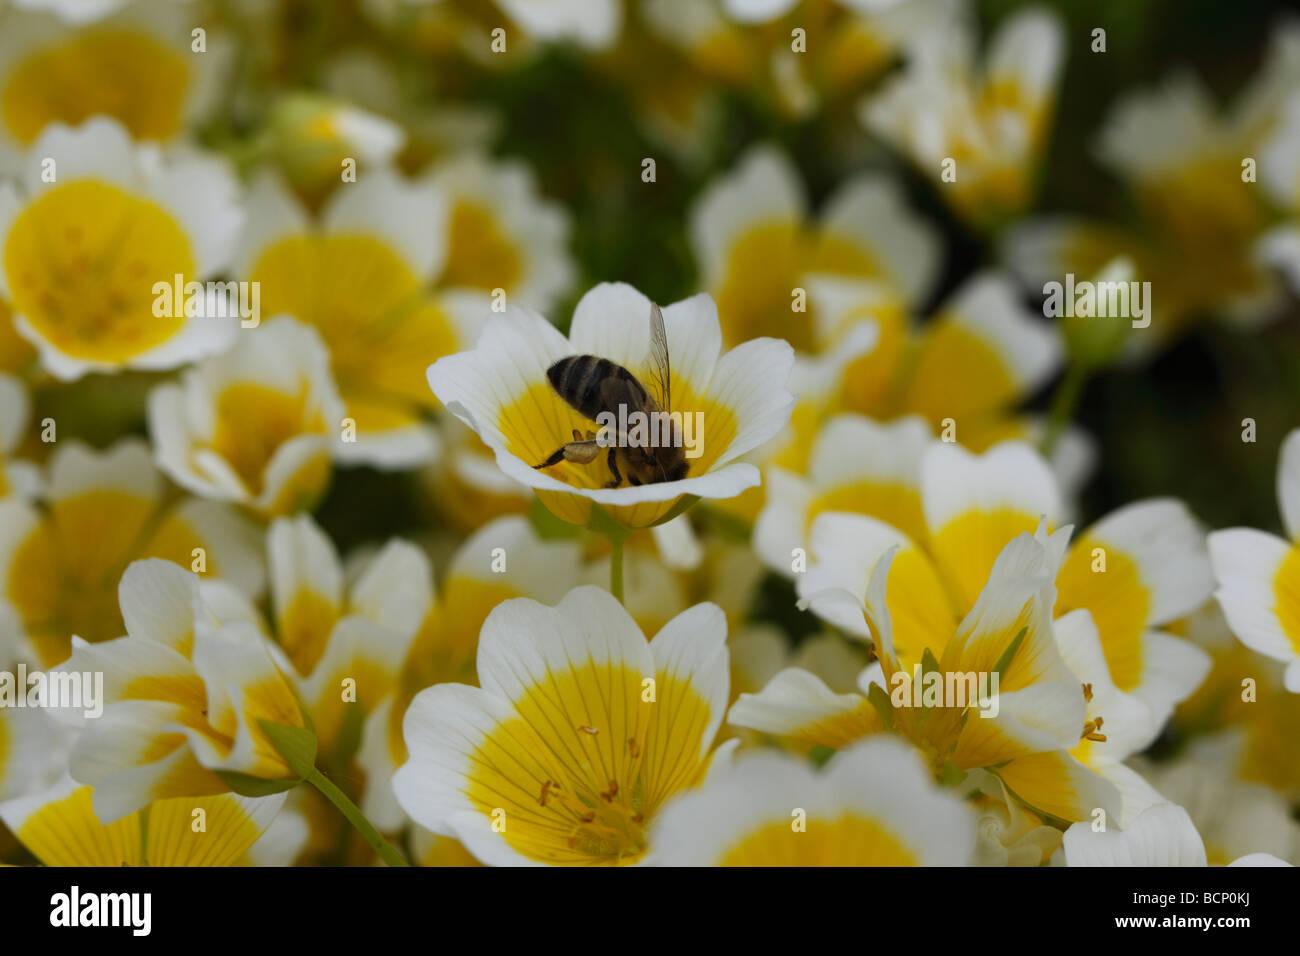 Honey bee Apis melifera taking nectar from poached egg plant flower - Stock Image